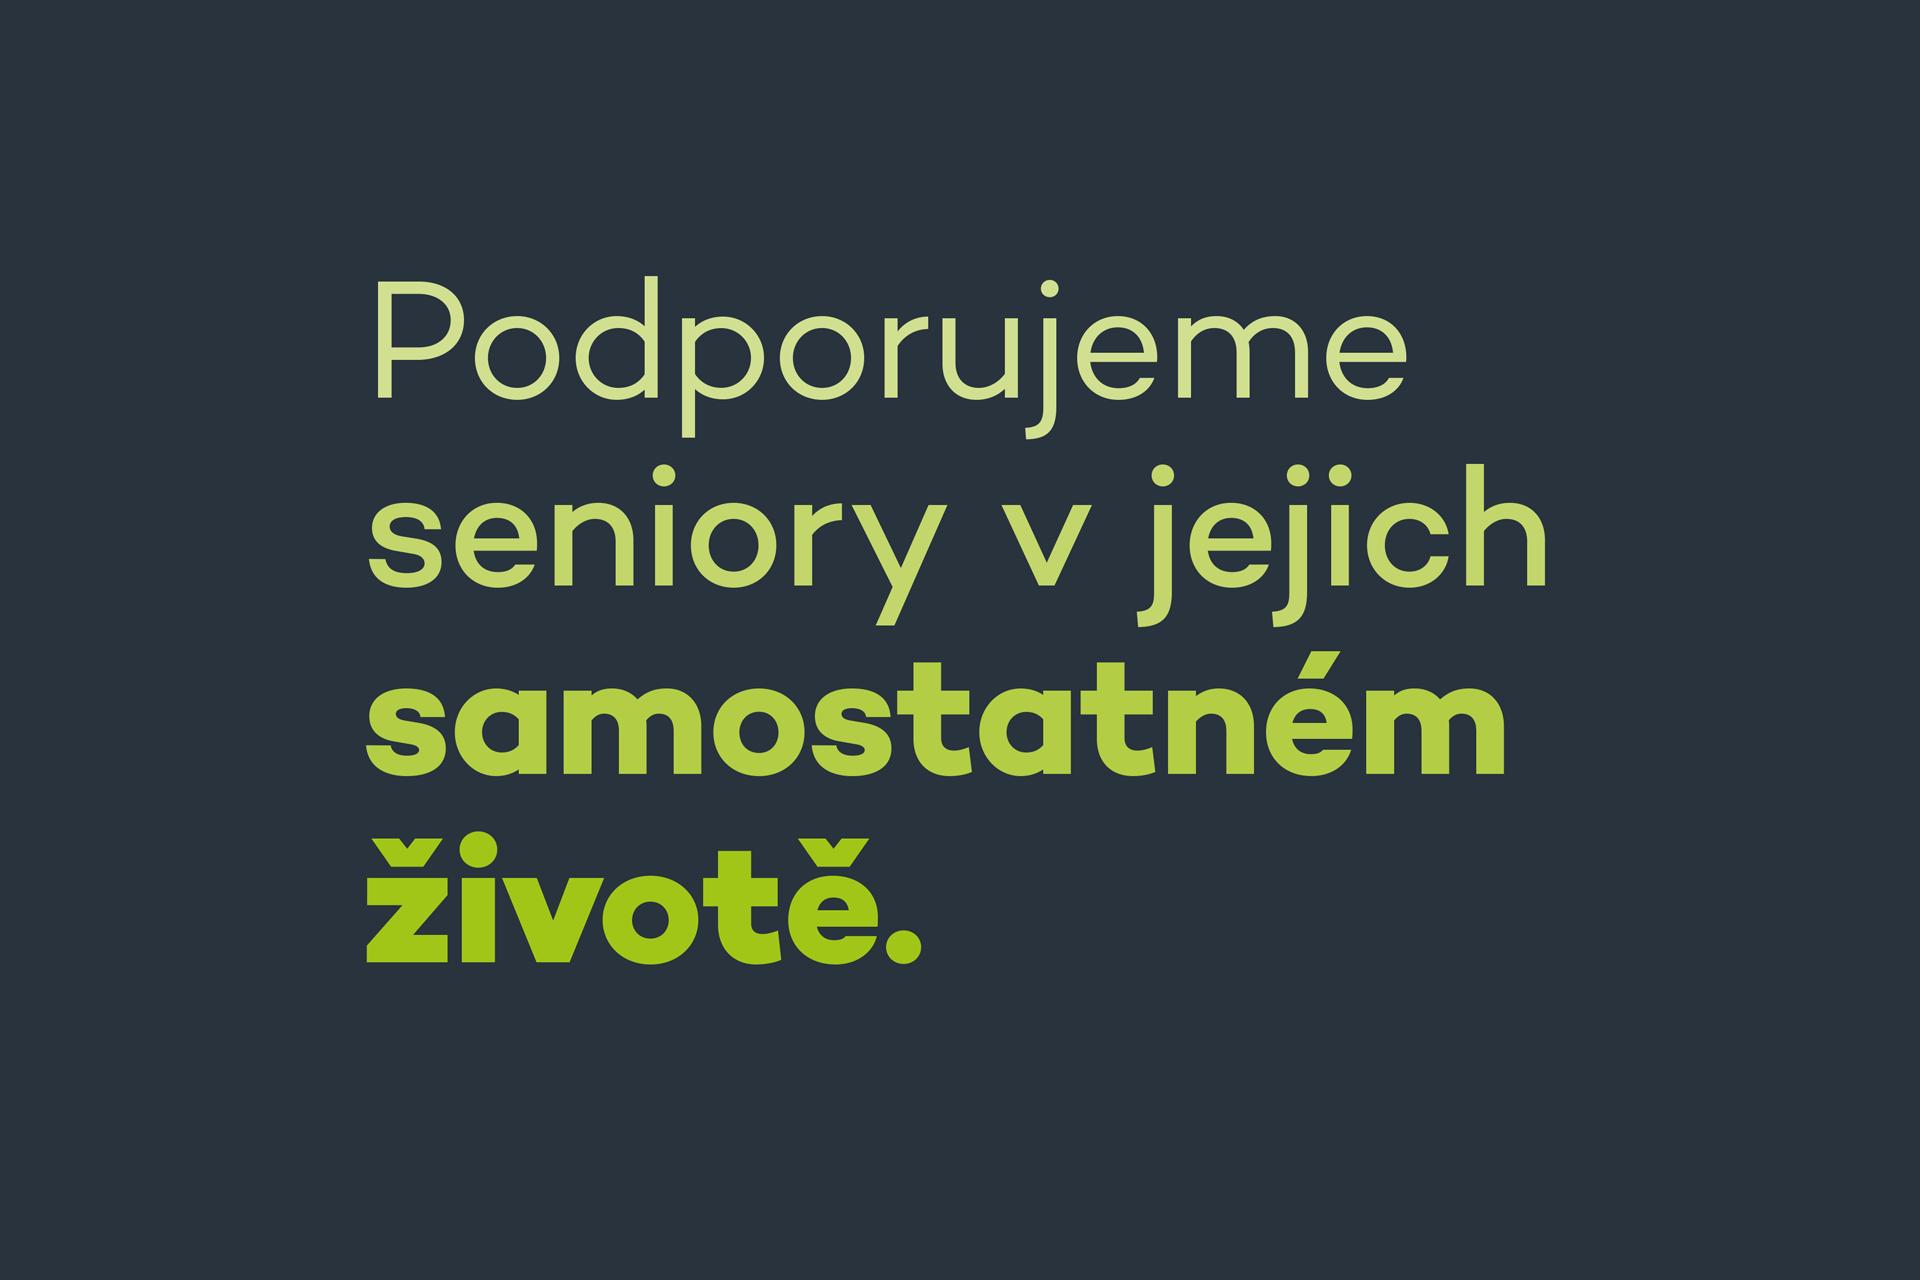 text_1920x1280px